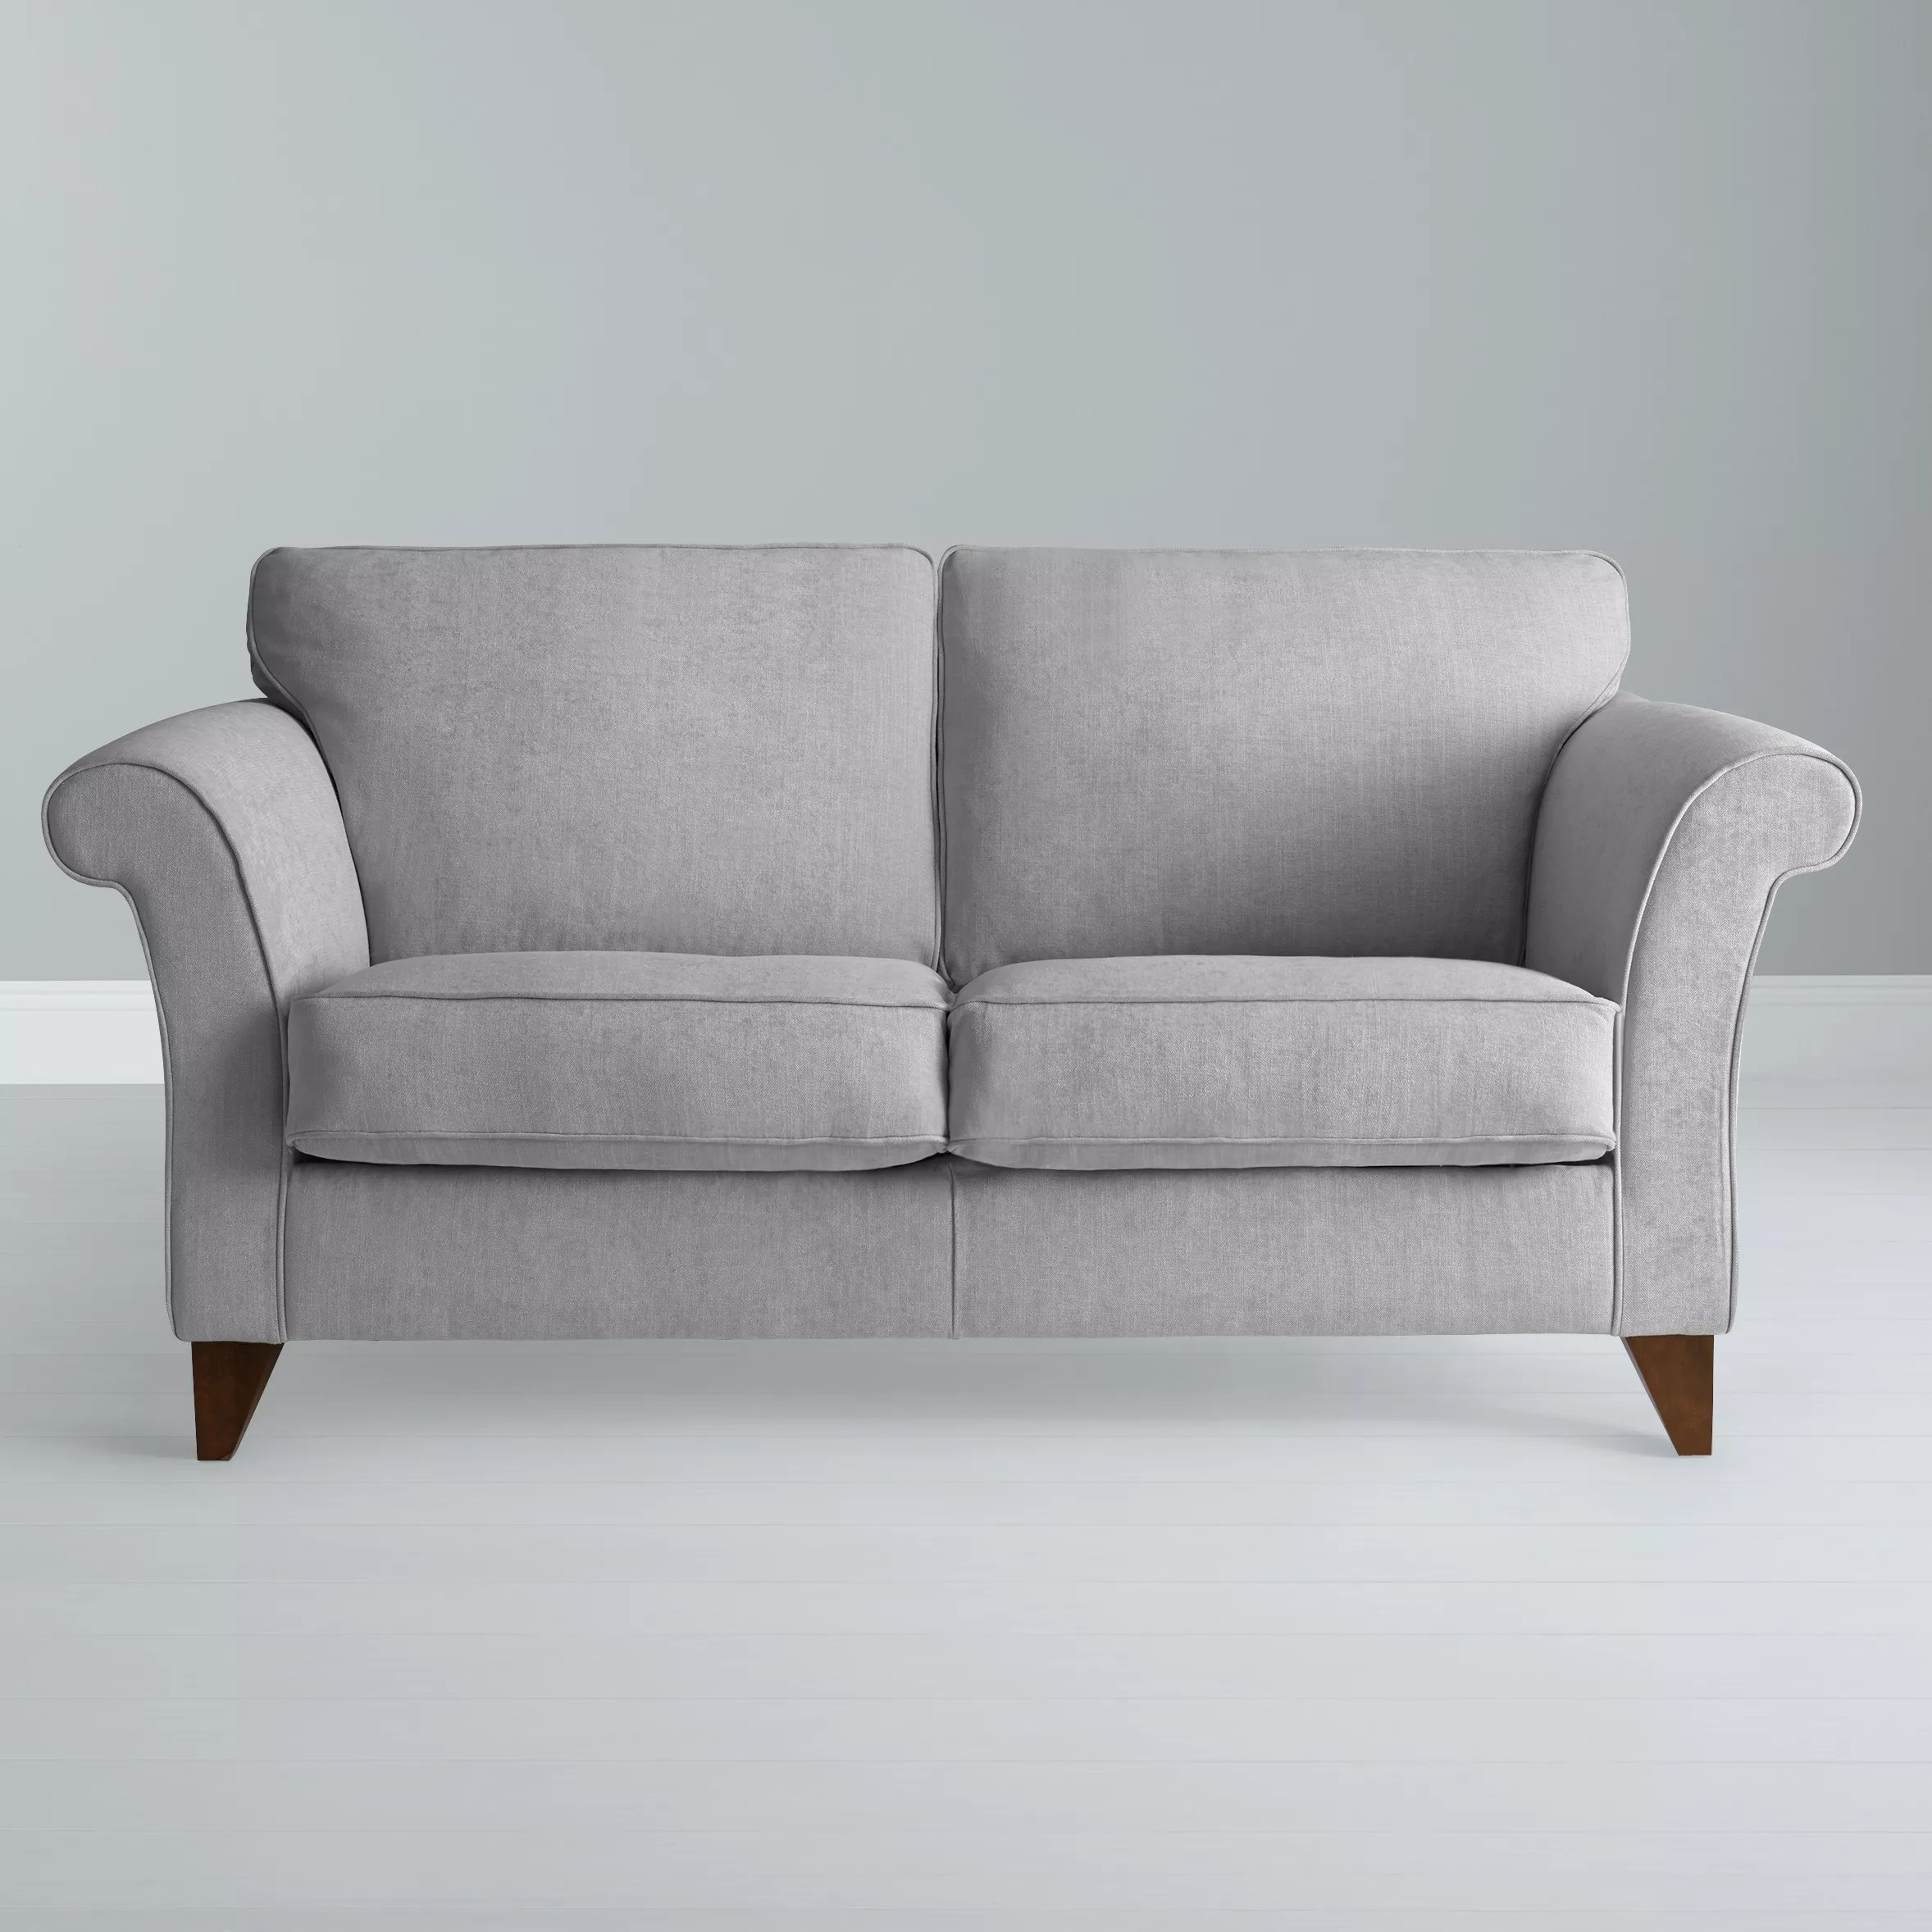 sleeper sofa charlotte nc sofaworks voucher code john lewis and partners medium 2 seater